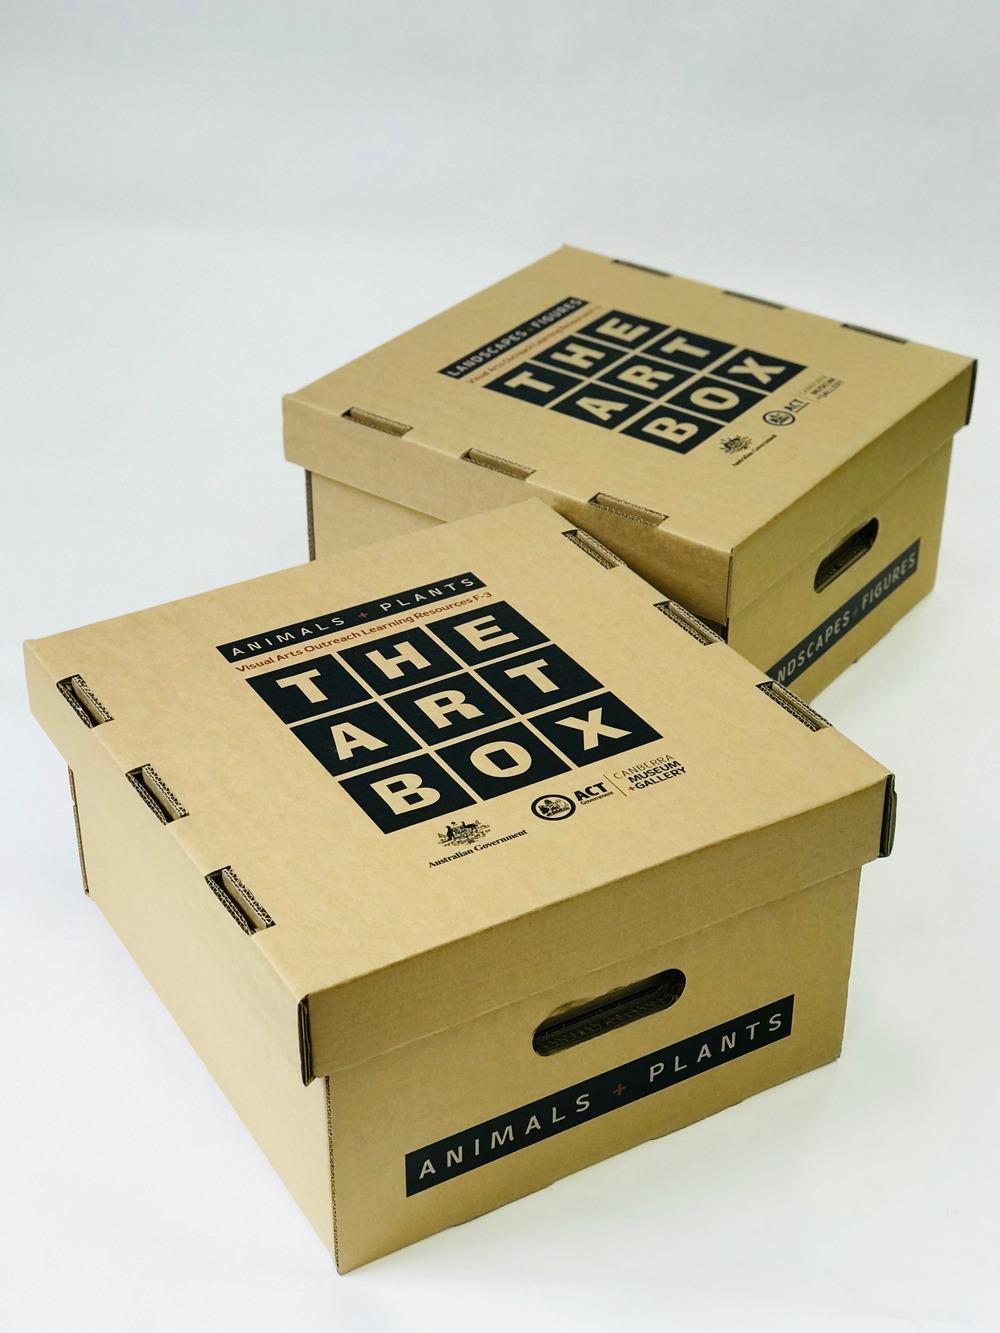 The Art Box